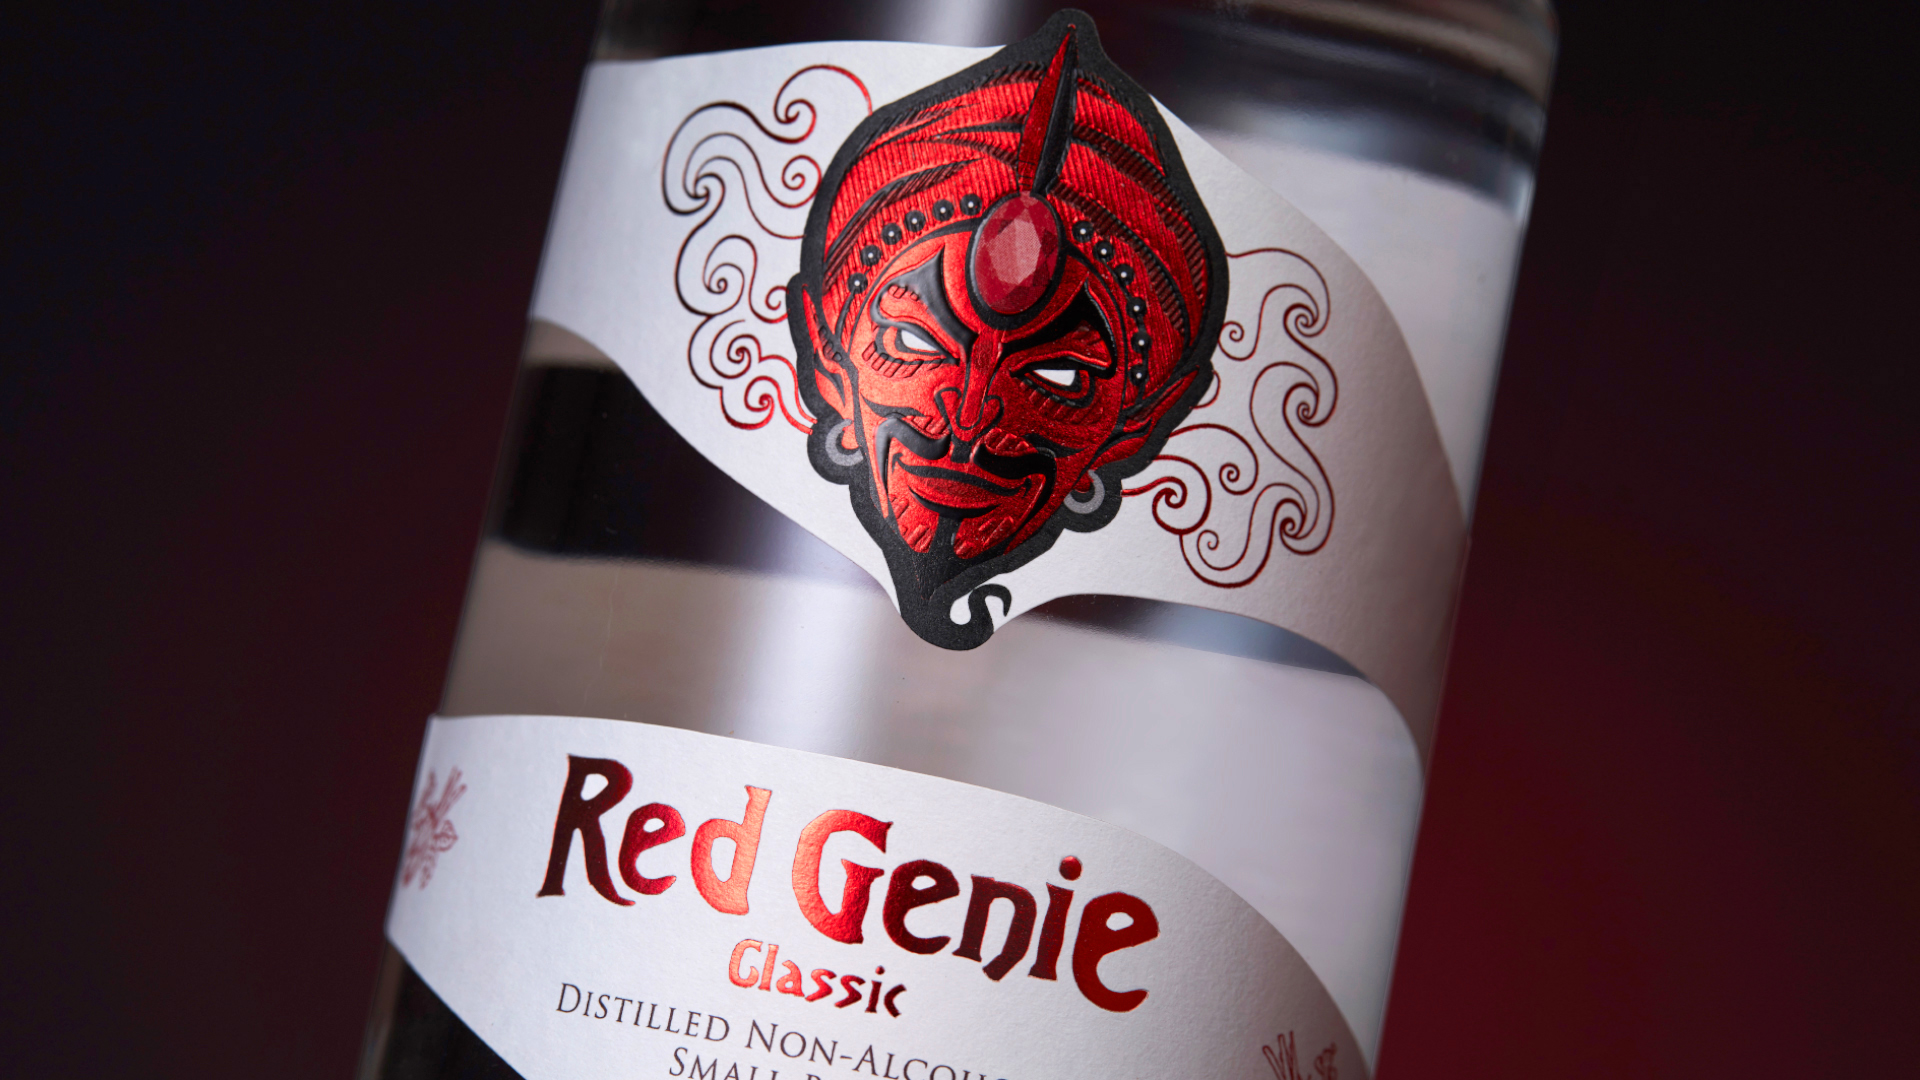 Red Genie Web 2.jpg